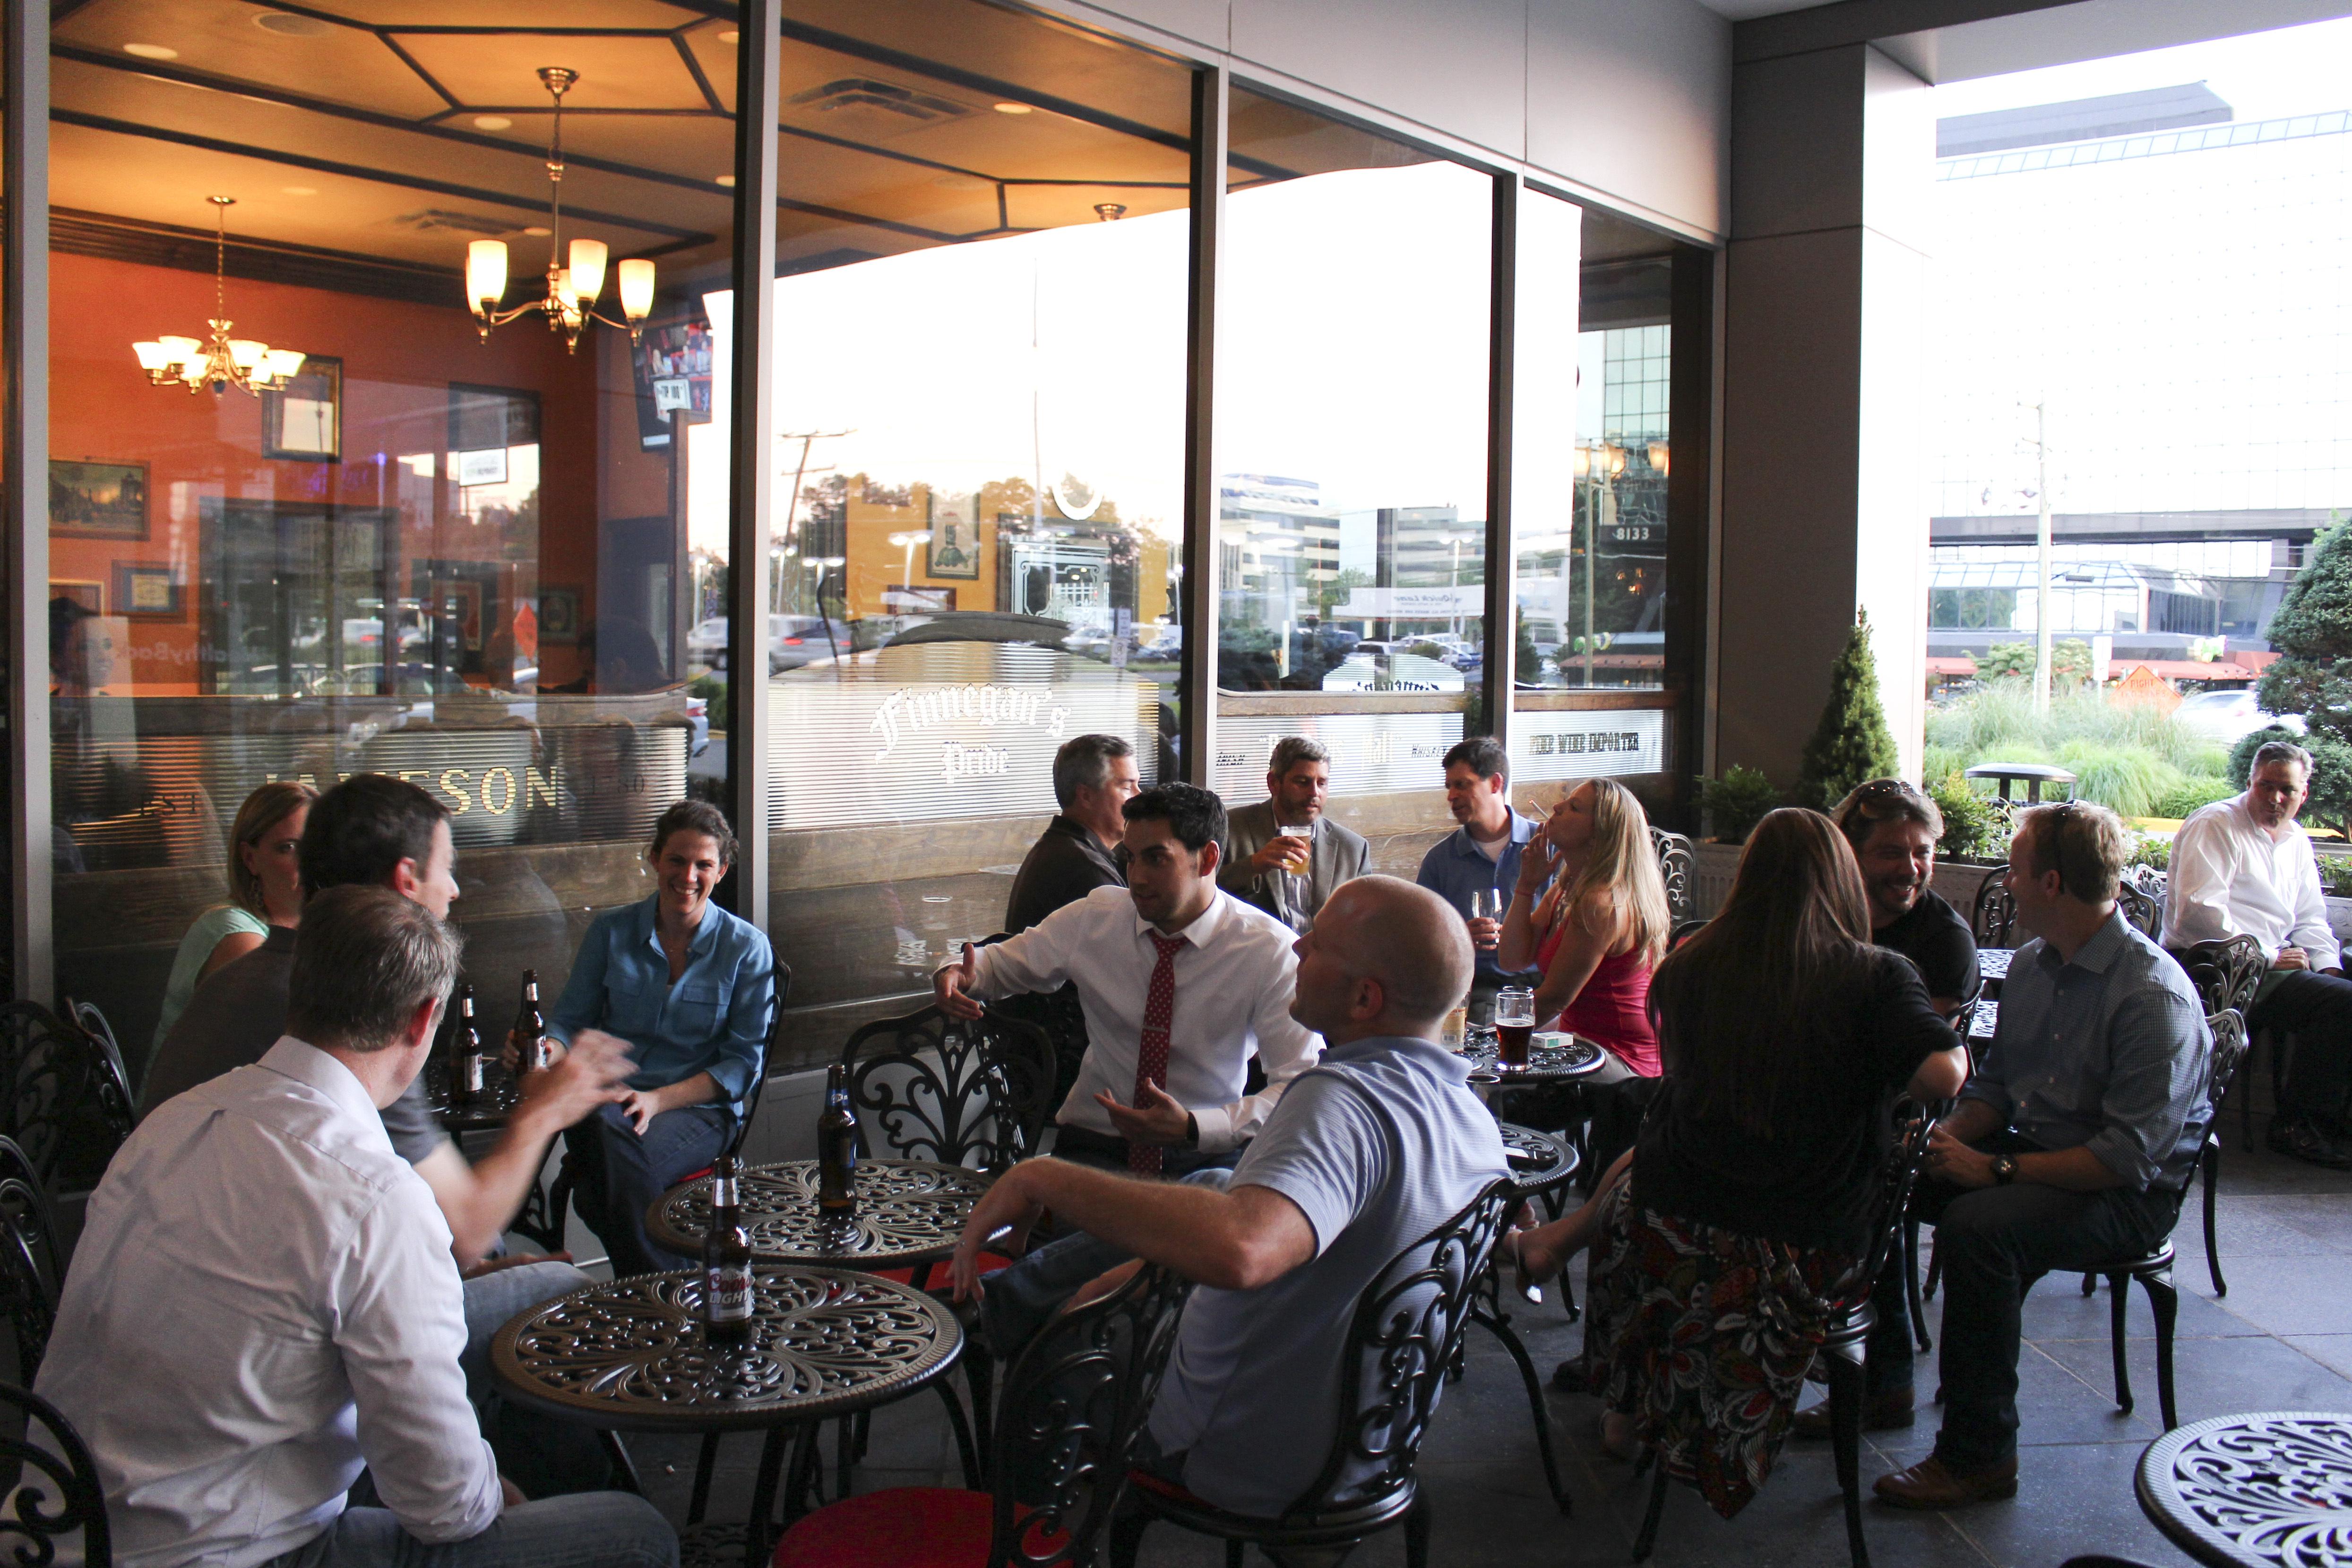 Finneganu0027s Pride Sports Restaurant Opens In Tysons Corner, VA | Business  Wire